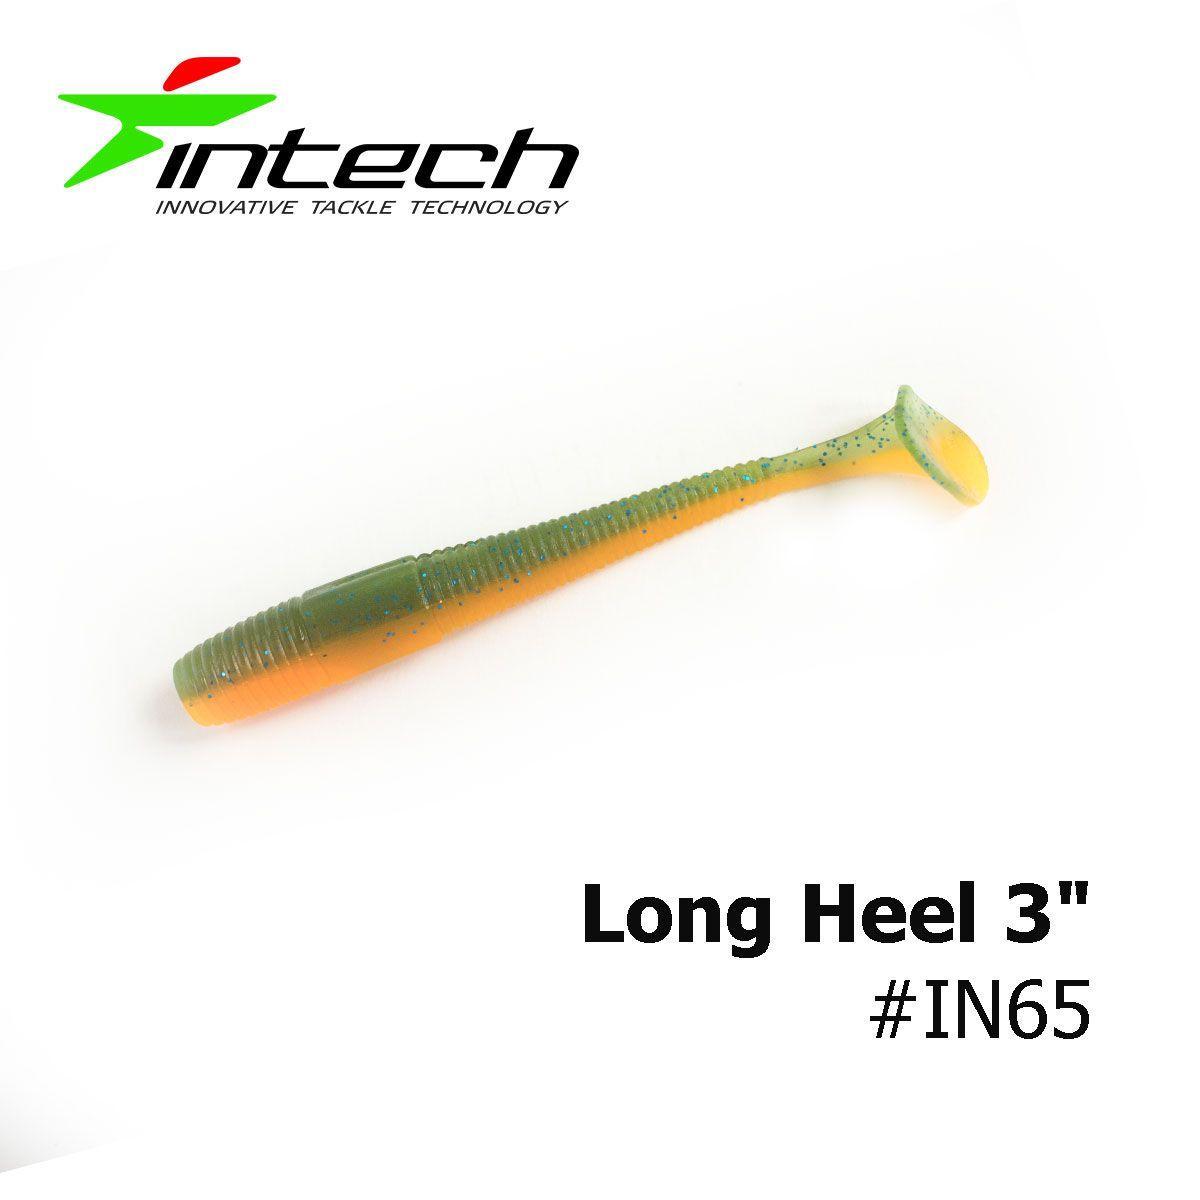 """.Приманка Intech Long Heel 3 ""(8 шт) (IN65)"